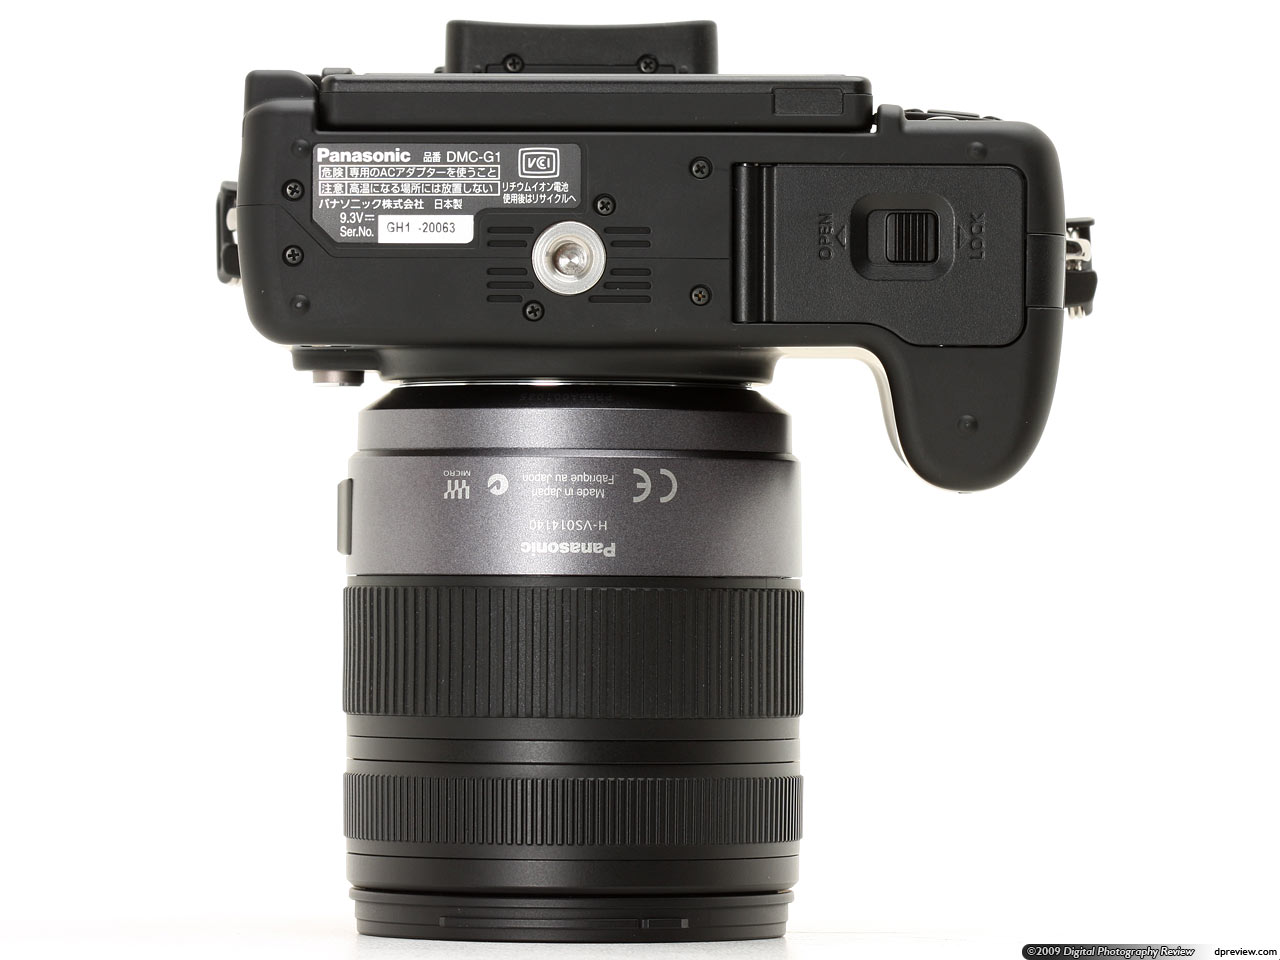 panasonic lumix dmc gh1 review digital photography review rh dpreview com Panasonic GH1 Manual Panasonic Lumix DMC -FP1